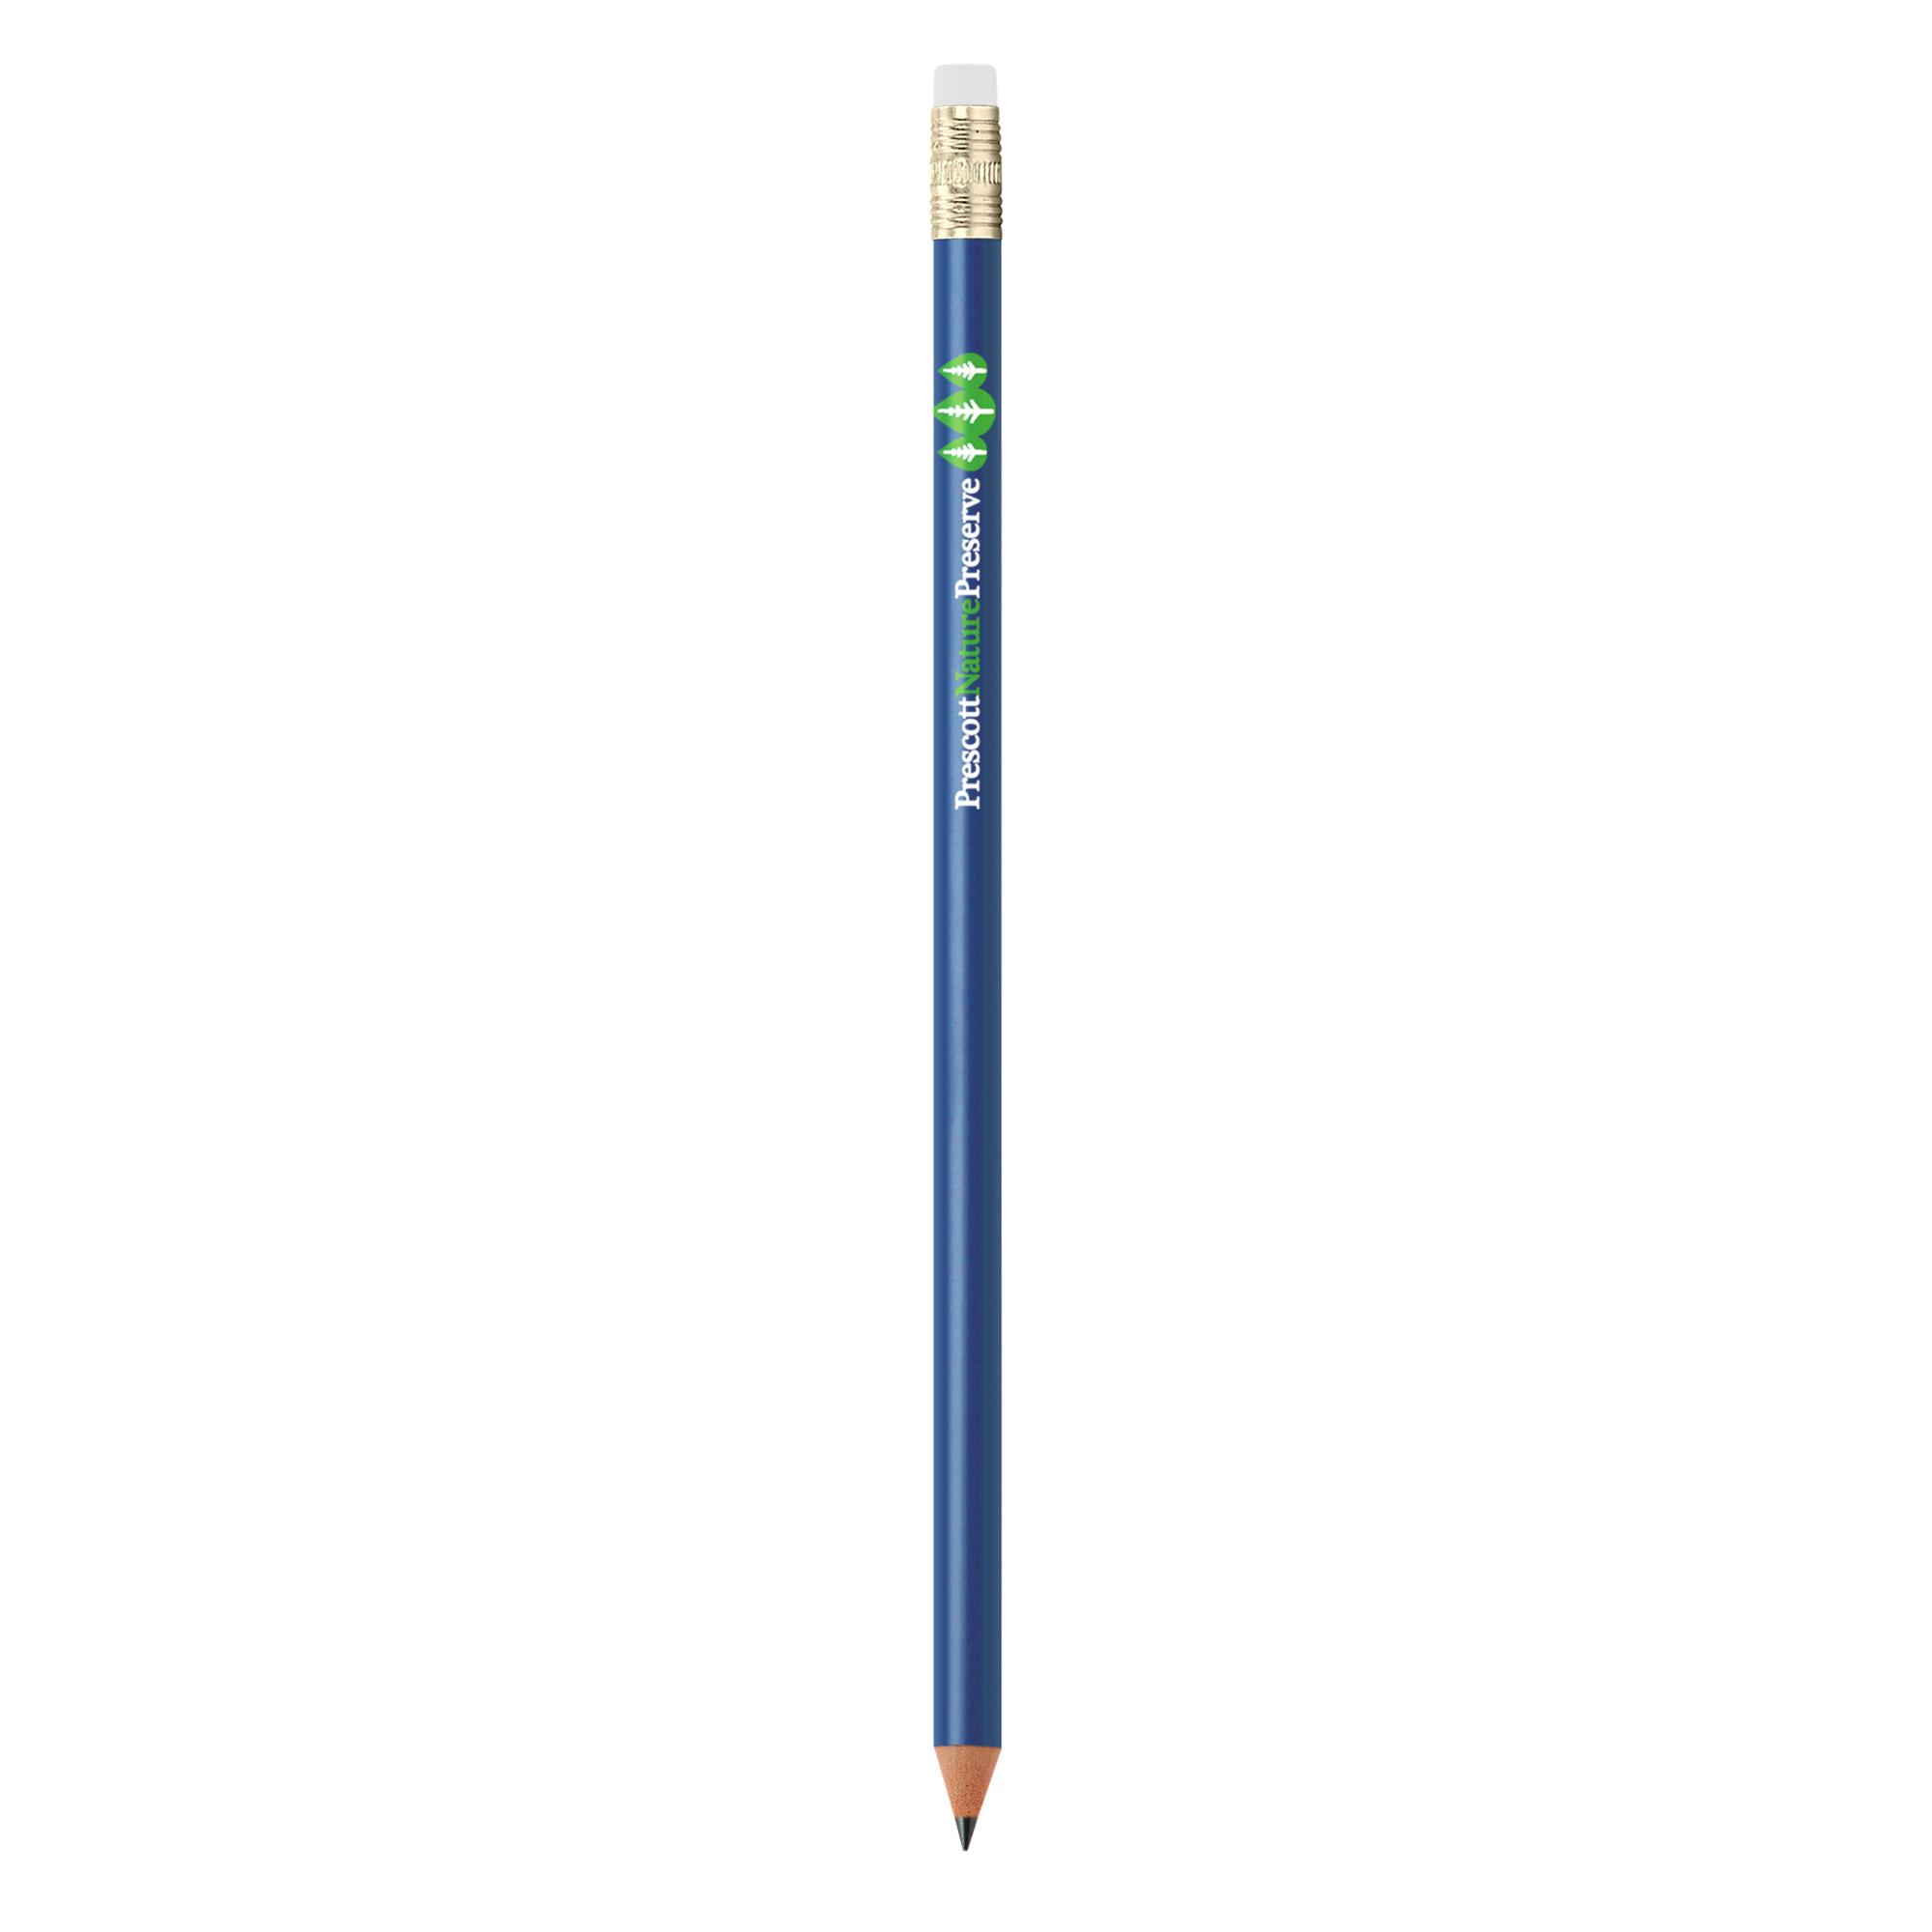 bic-pencil-eraser-1151